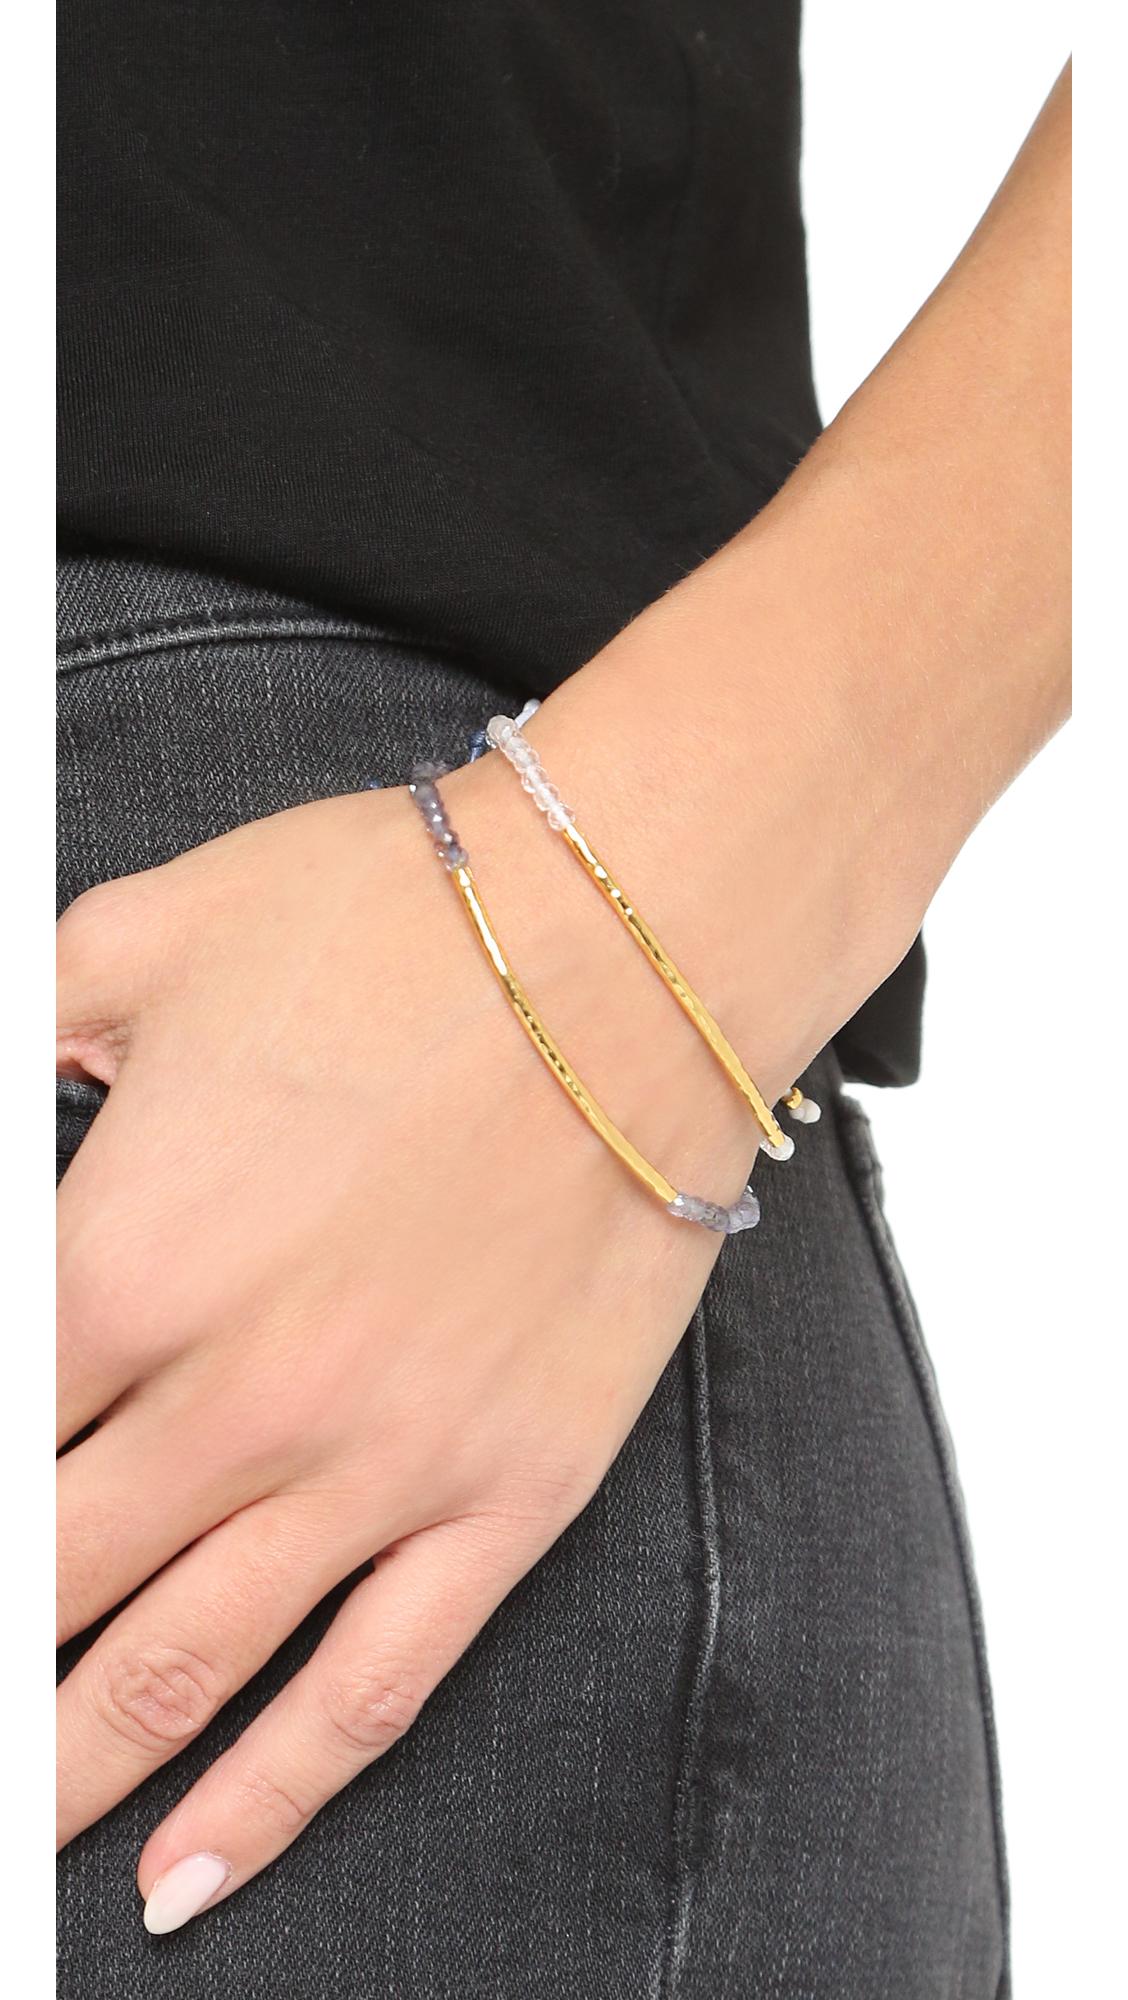 Gorjana Taner Gemstone Bracelet in Black bPOnWl9GJ